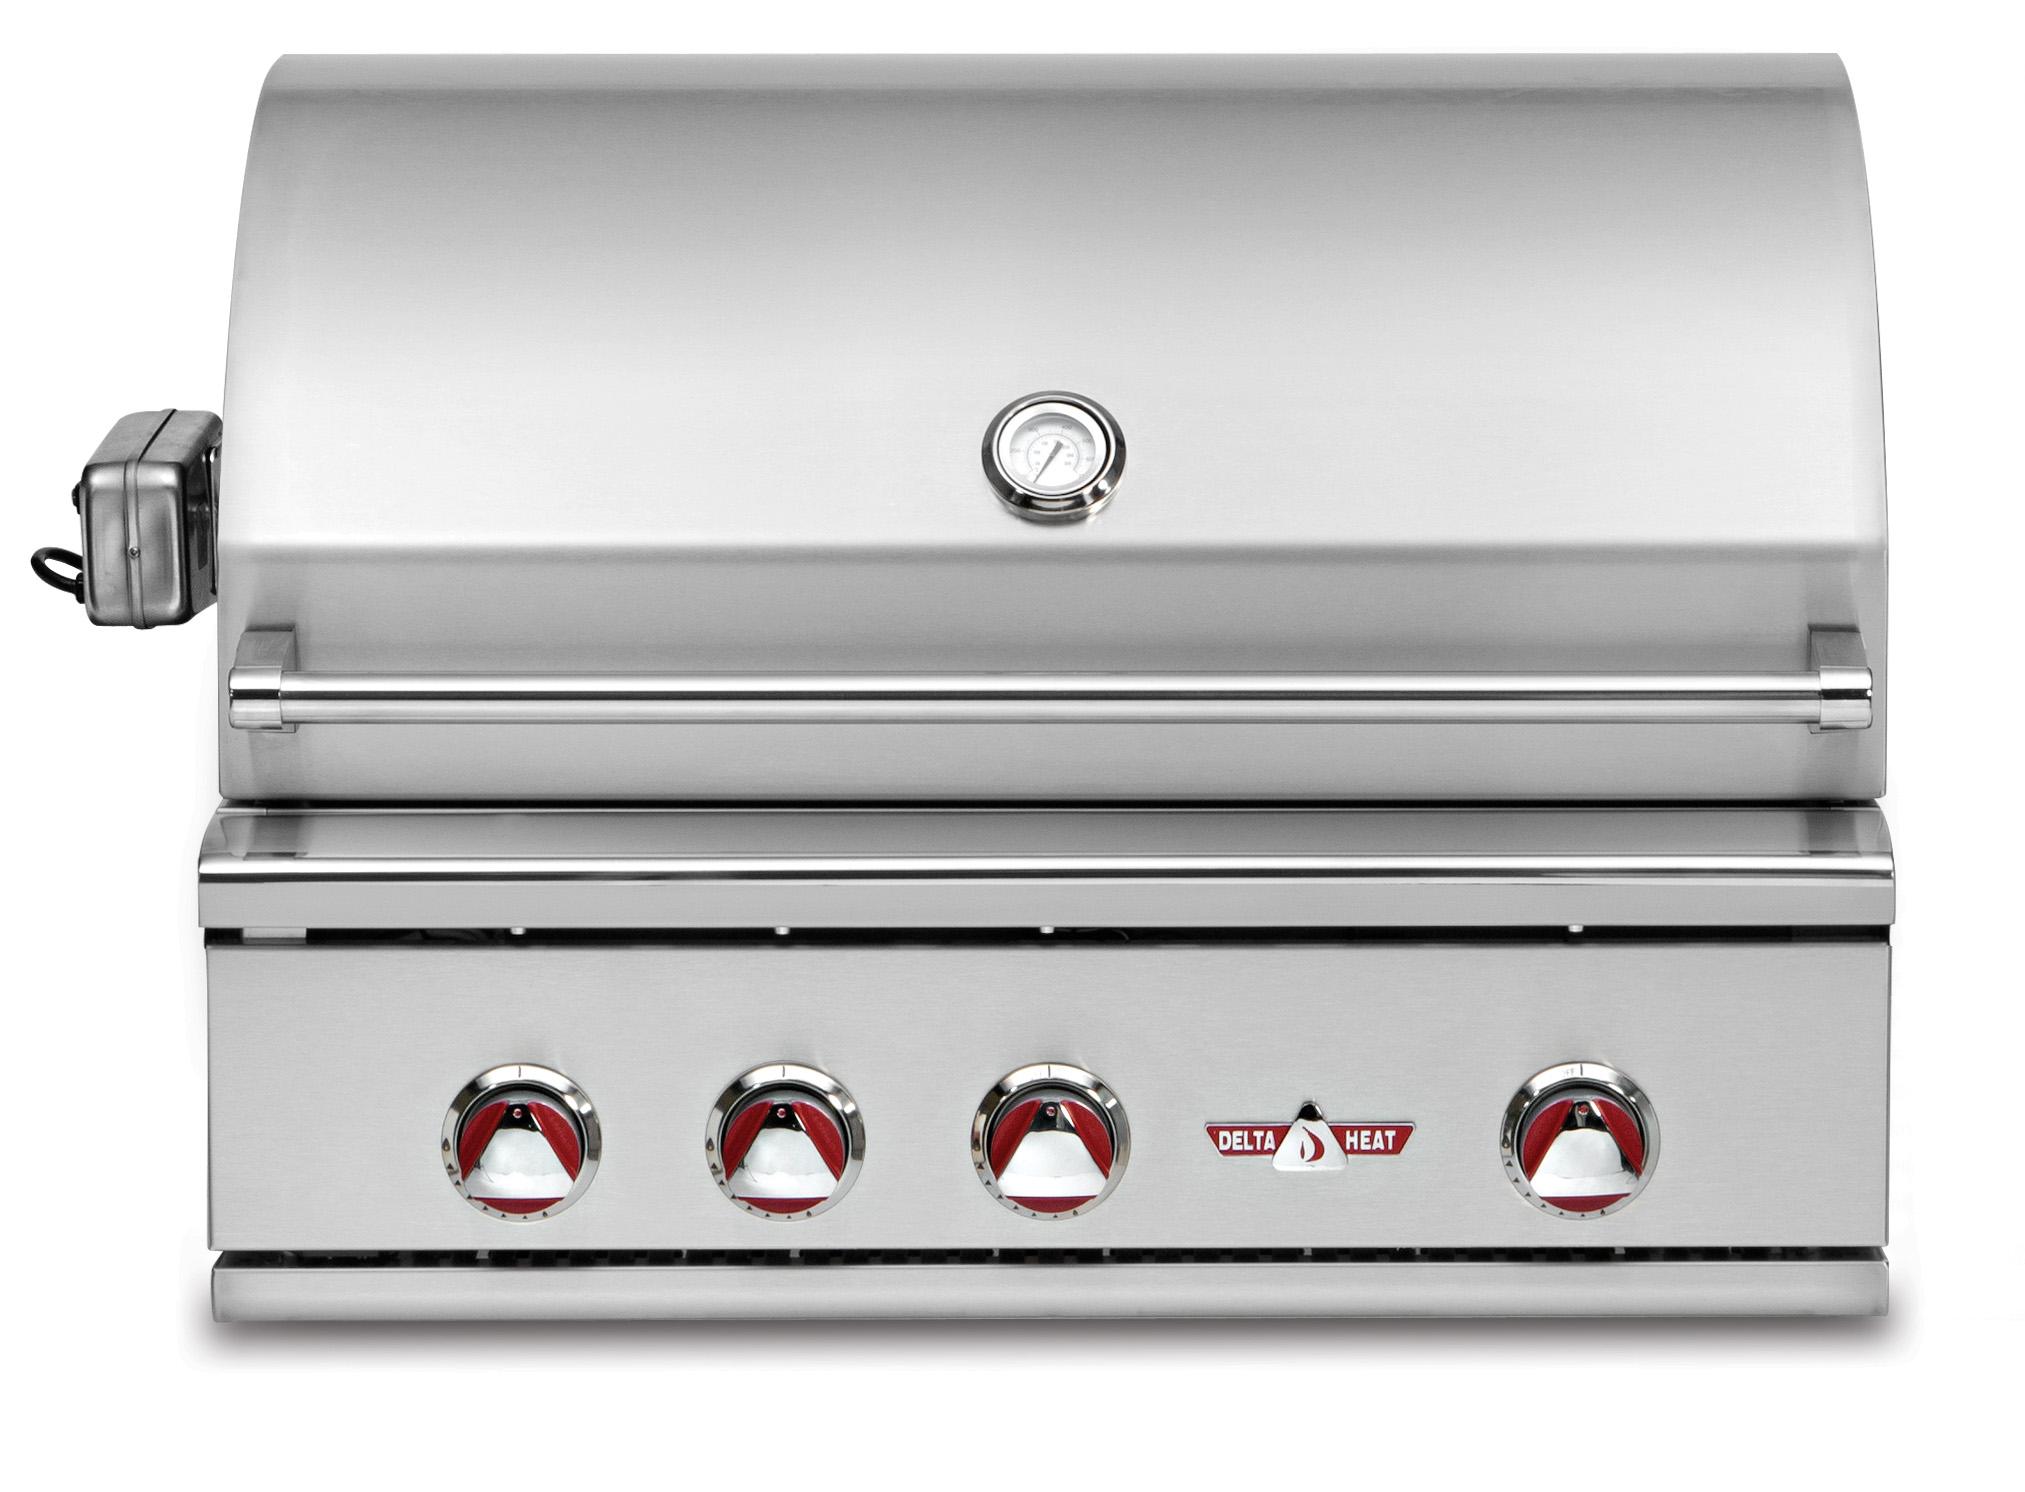 "Delta Heat 32"" Built-in Grill"